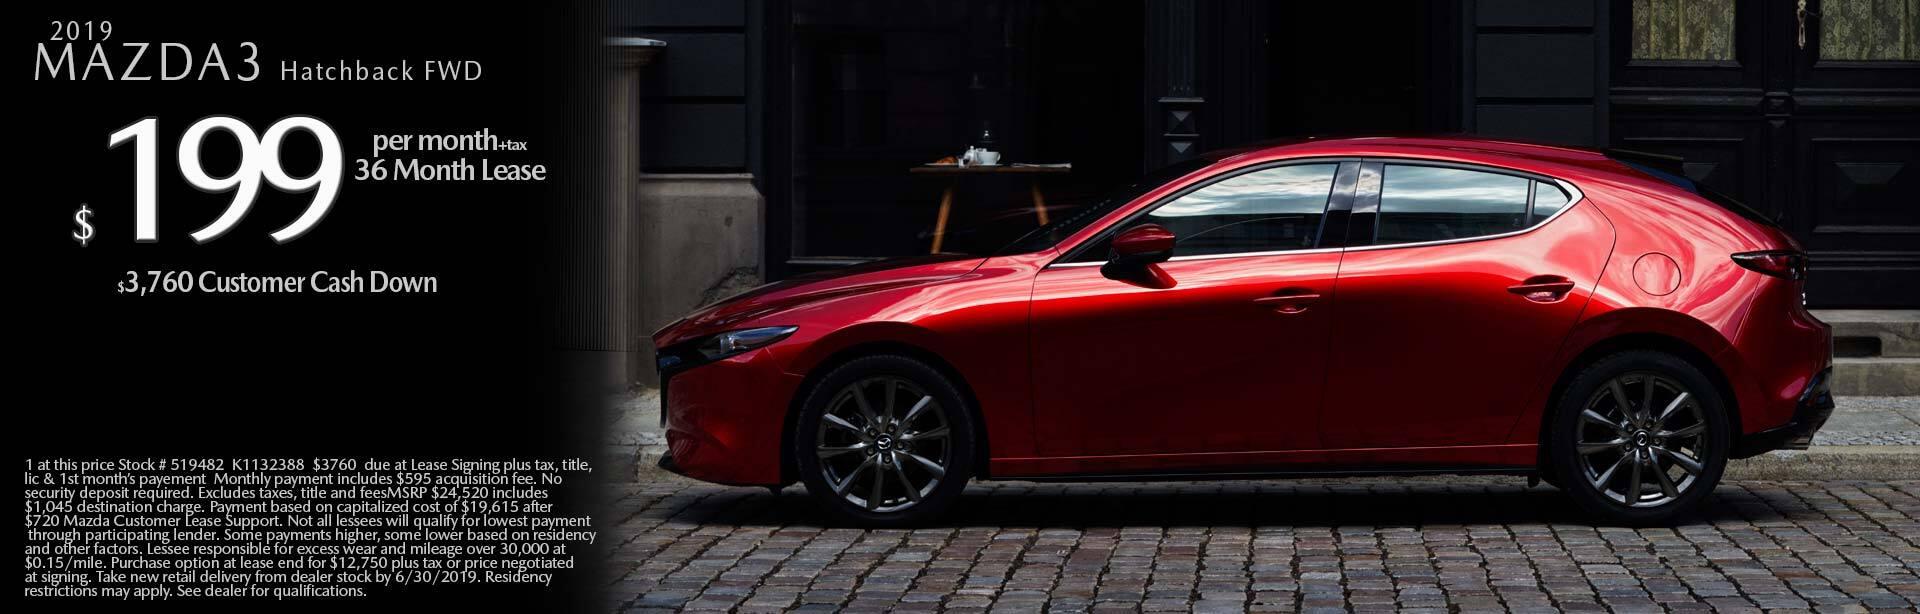 2019 Mazda Mazda3 Hatchback Hatchback 2WD